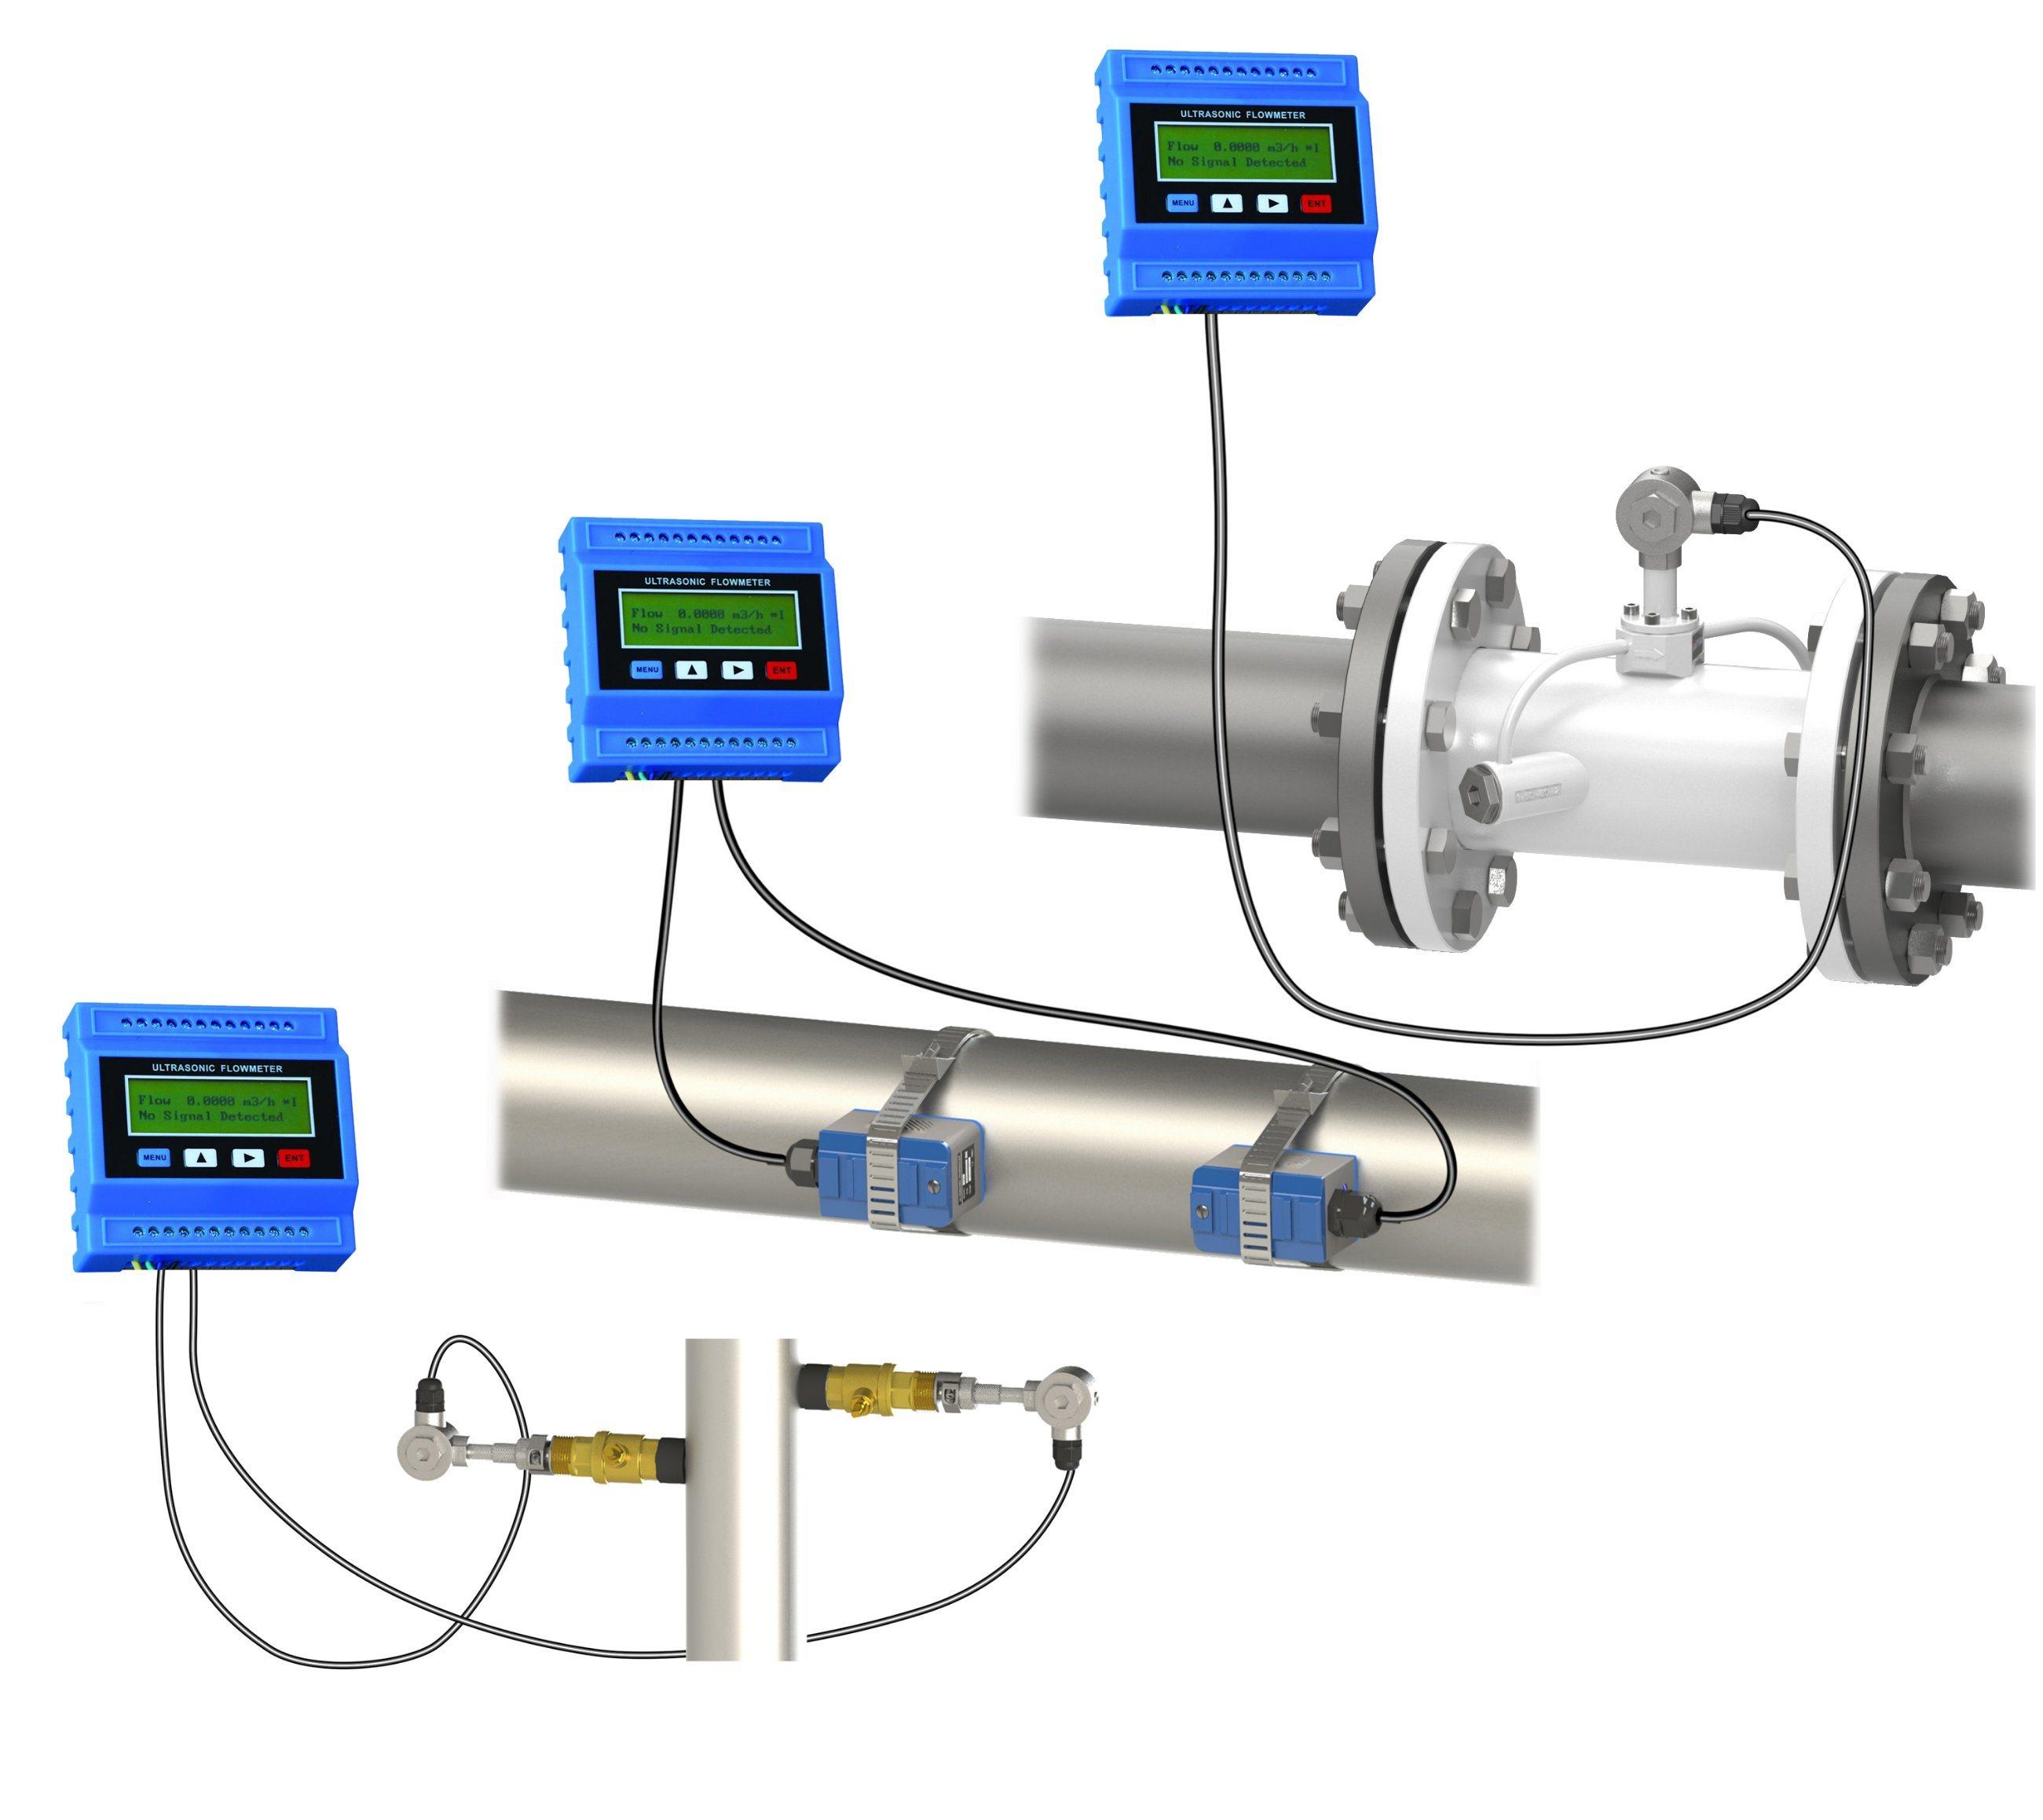 China Tipos De Medidores De Flujo Wall Mounted Fixed Ultrasonic Water Meter  Flowmeter - China Ultrasonic Water Meter [ 2317 x 2601 Pixel ]